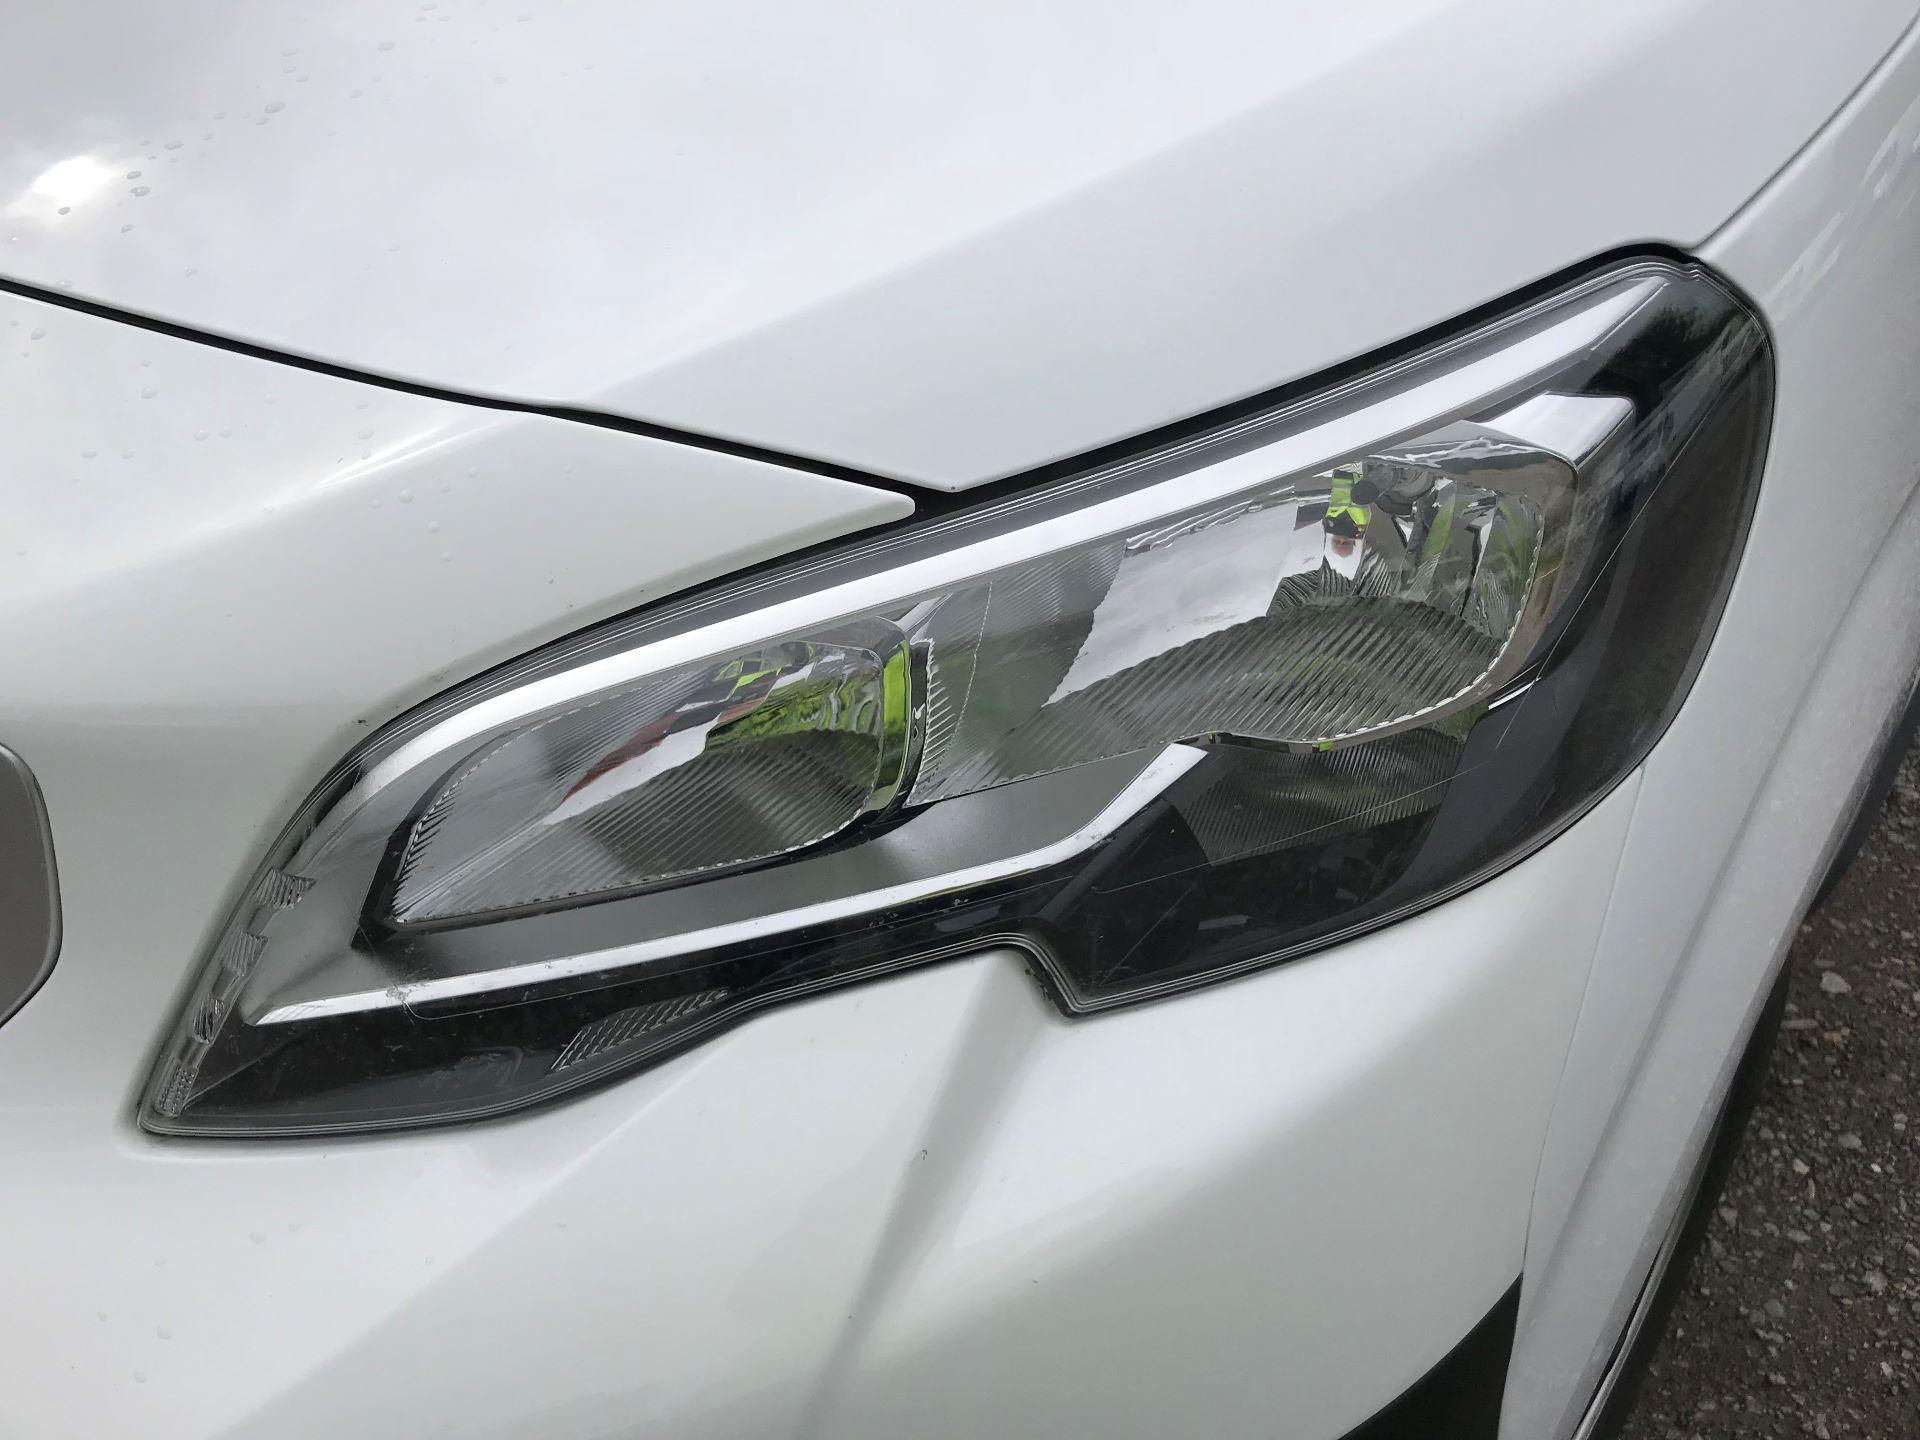 2018 Peugeot Expert STANDARD 1000 1.6 BLUEHDI 95 PROFESSIONAL EURO 6 (NU18PFO) Image 26